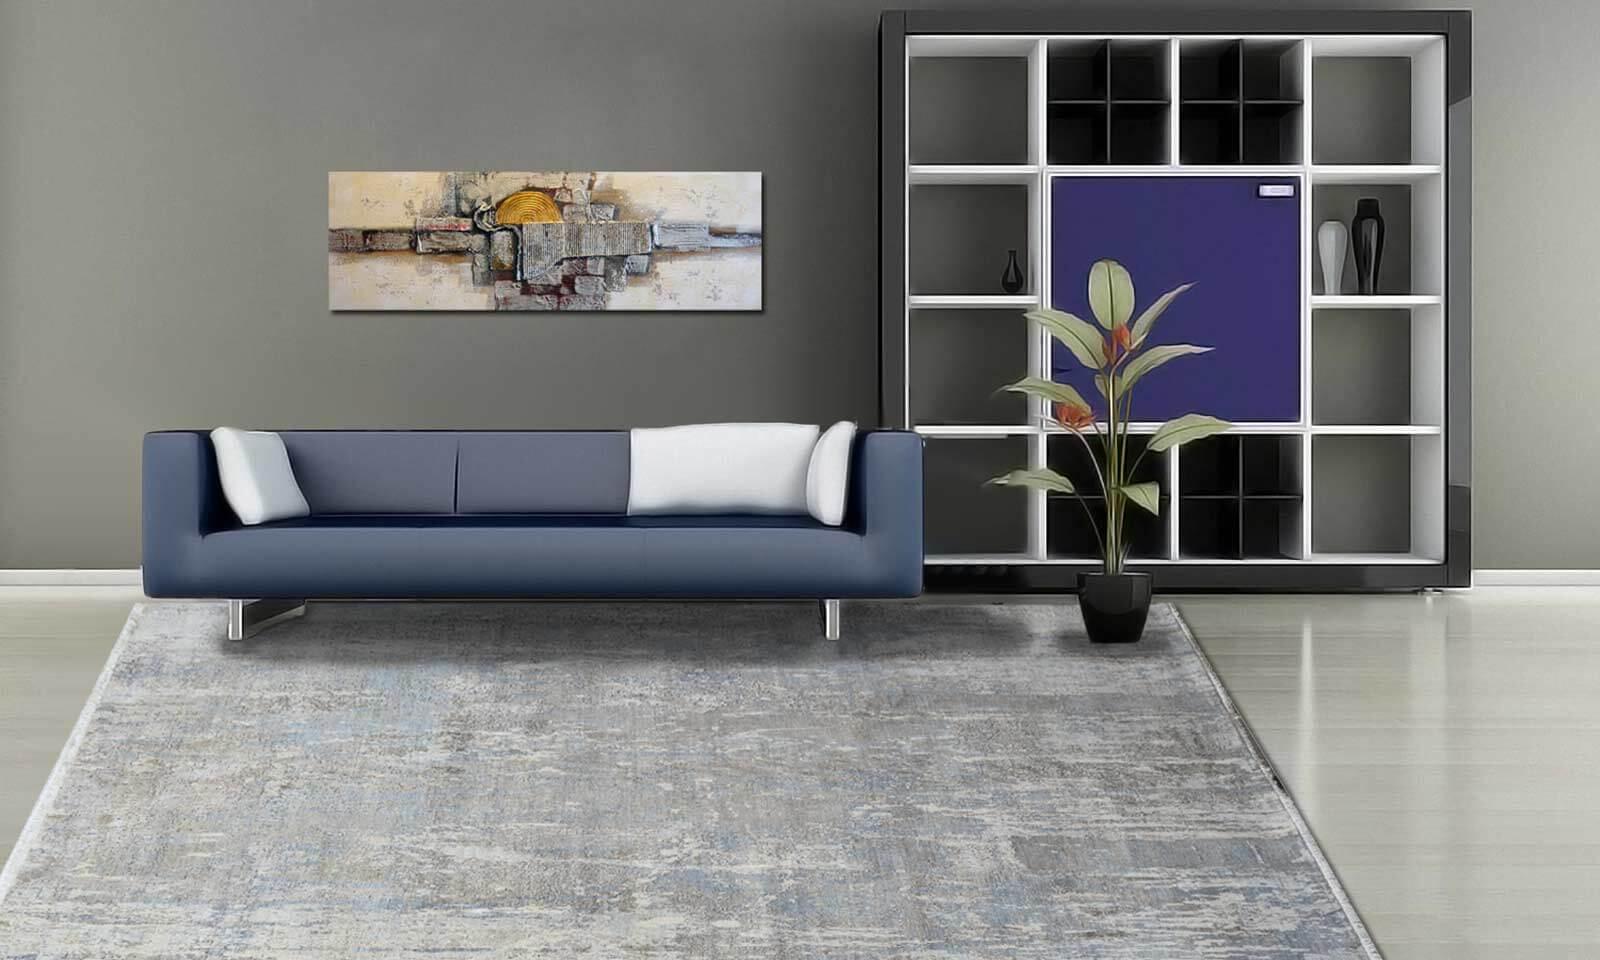 avant-garde-twilight-luxe-design-moderne-exclusieve-interieur2